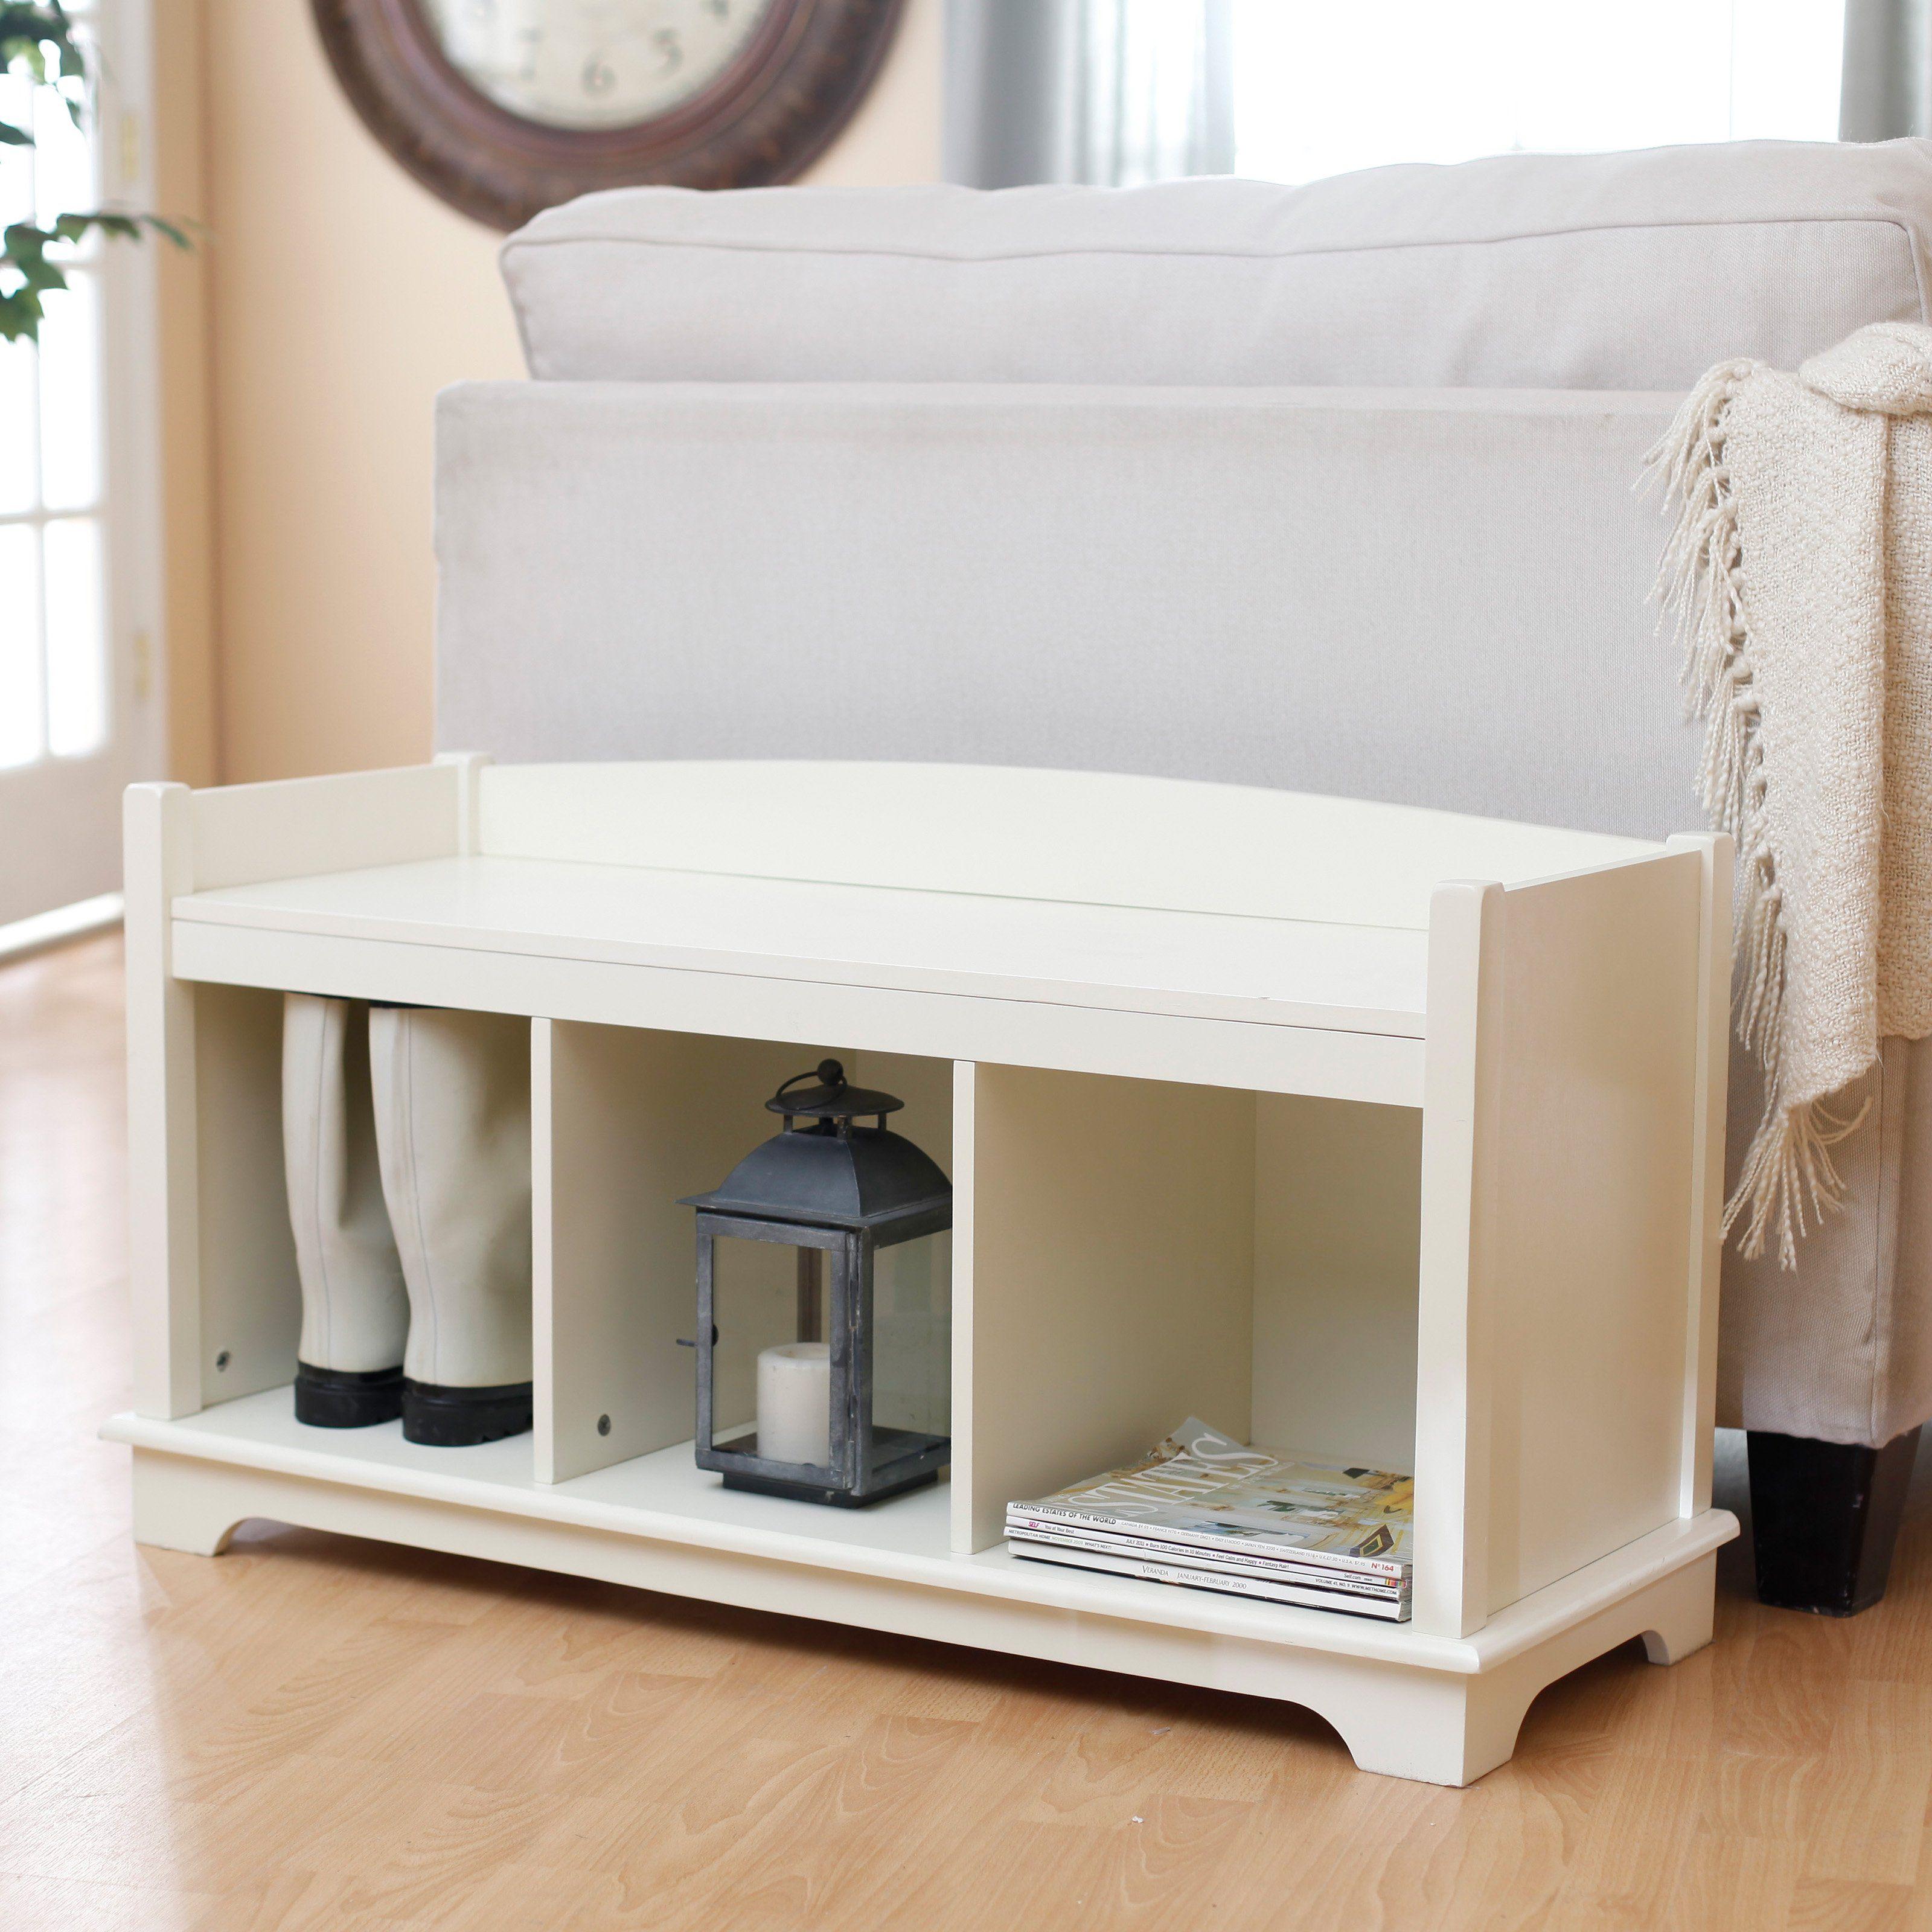 Kendall Cubbie Bench Antique White Www Hayneedle Com Indoor Storage Bench Mudroom Furniture Home